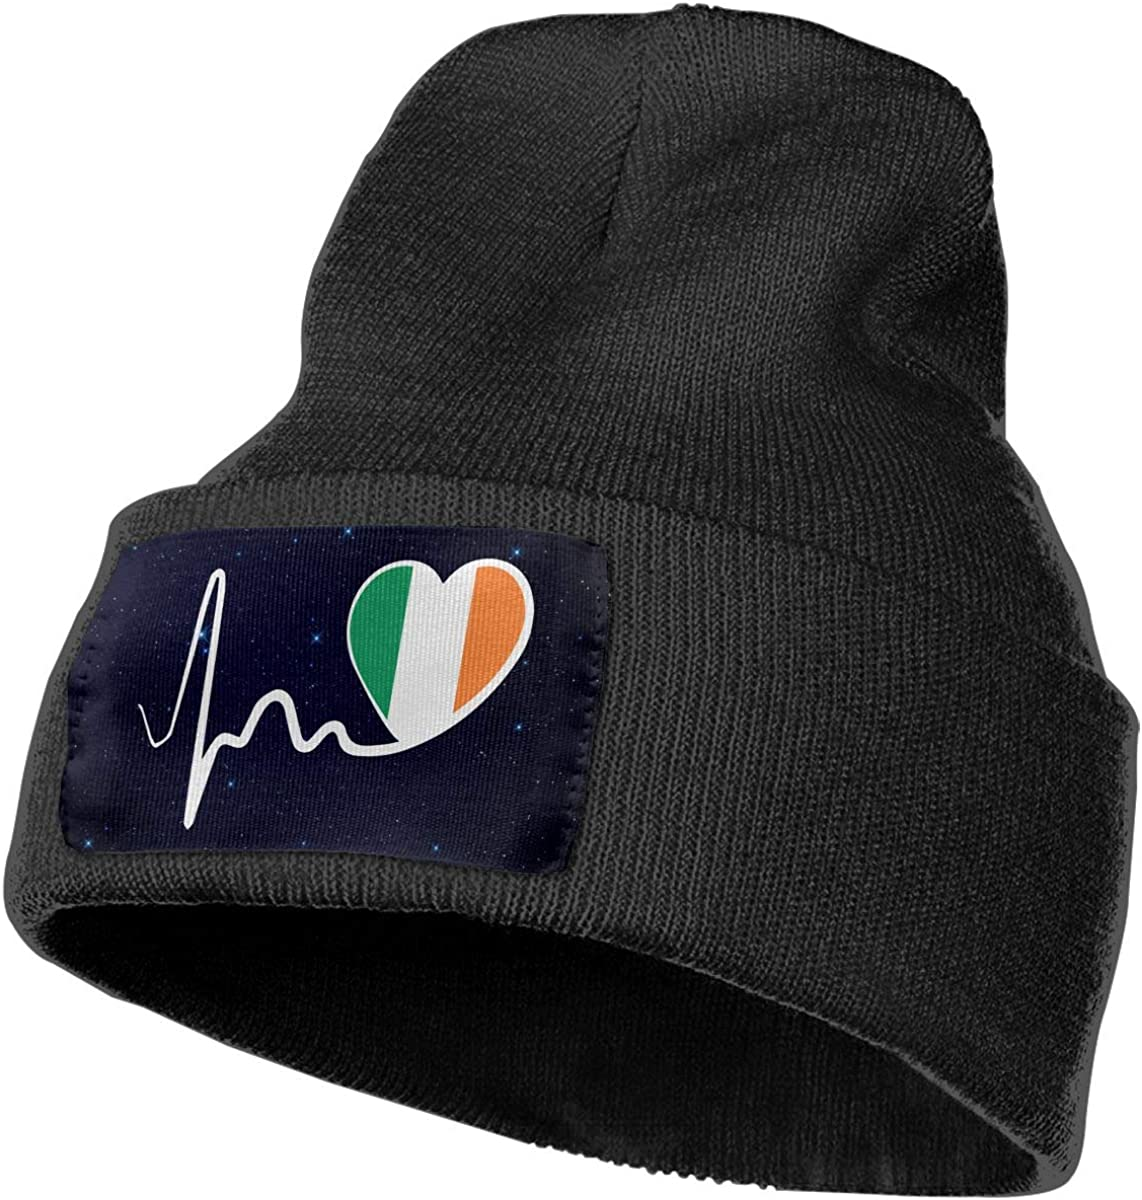 Irish Flag Heartbeat-1 Beanie Cap Hat Men /& Women Knit Hats Stretchy /& Soft Beanie